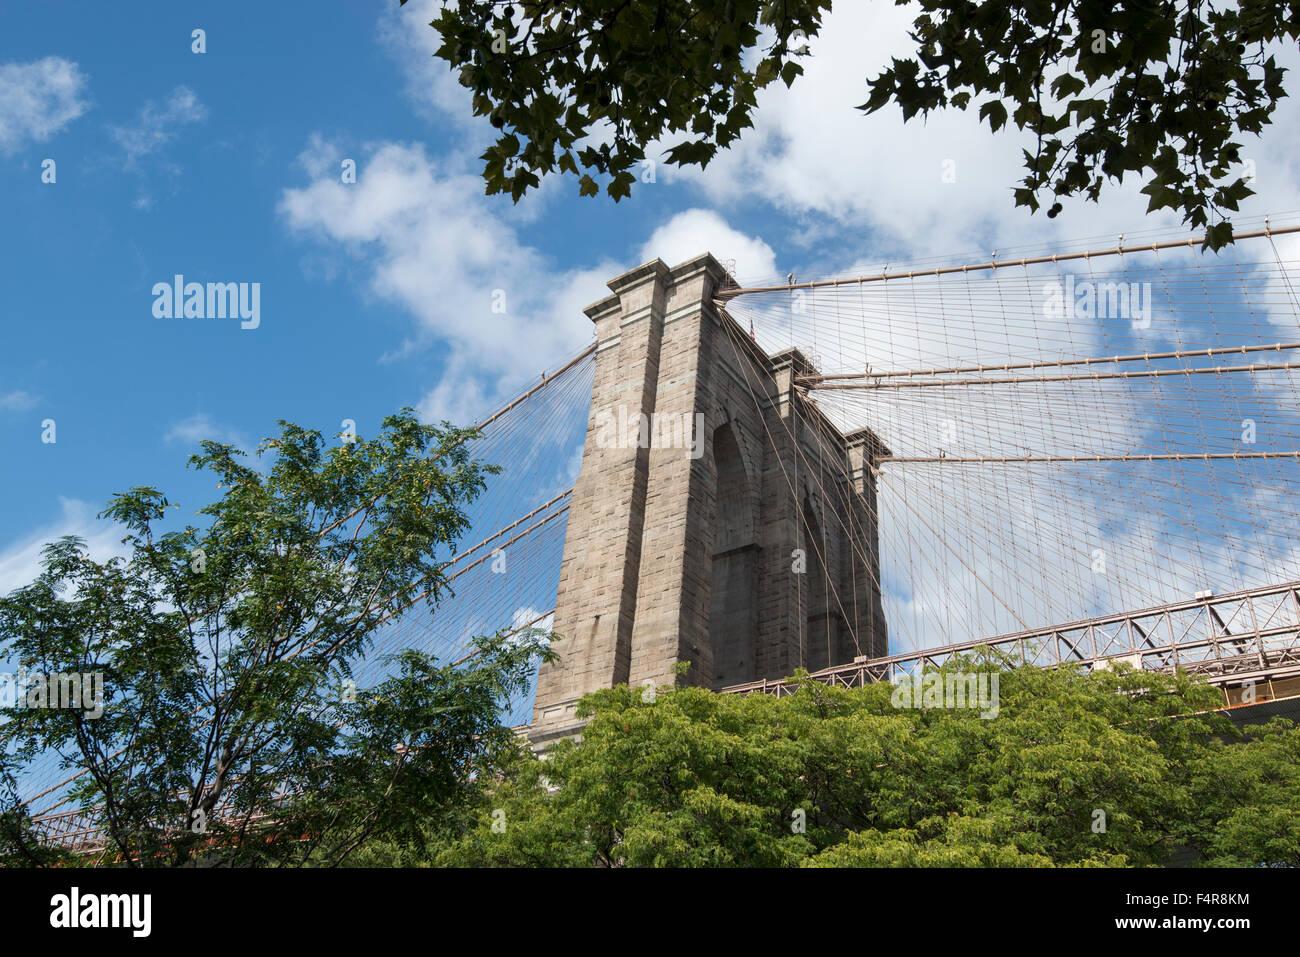 Le Pont de Brooklyn, extraite du DUMBO park à Brooklyn, New York USA Photo Stock